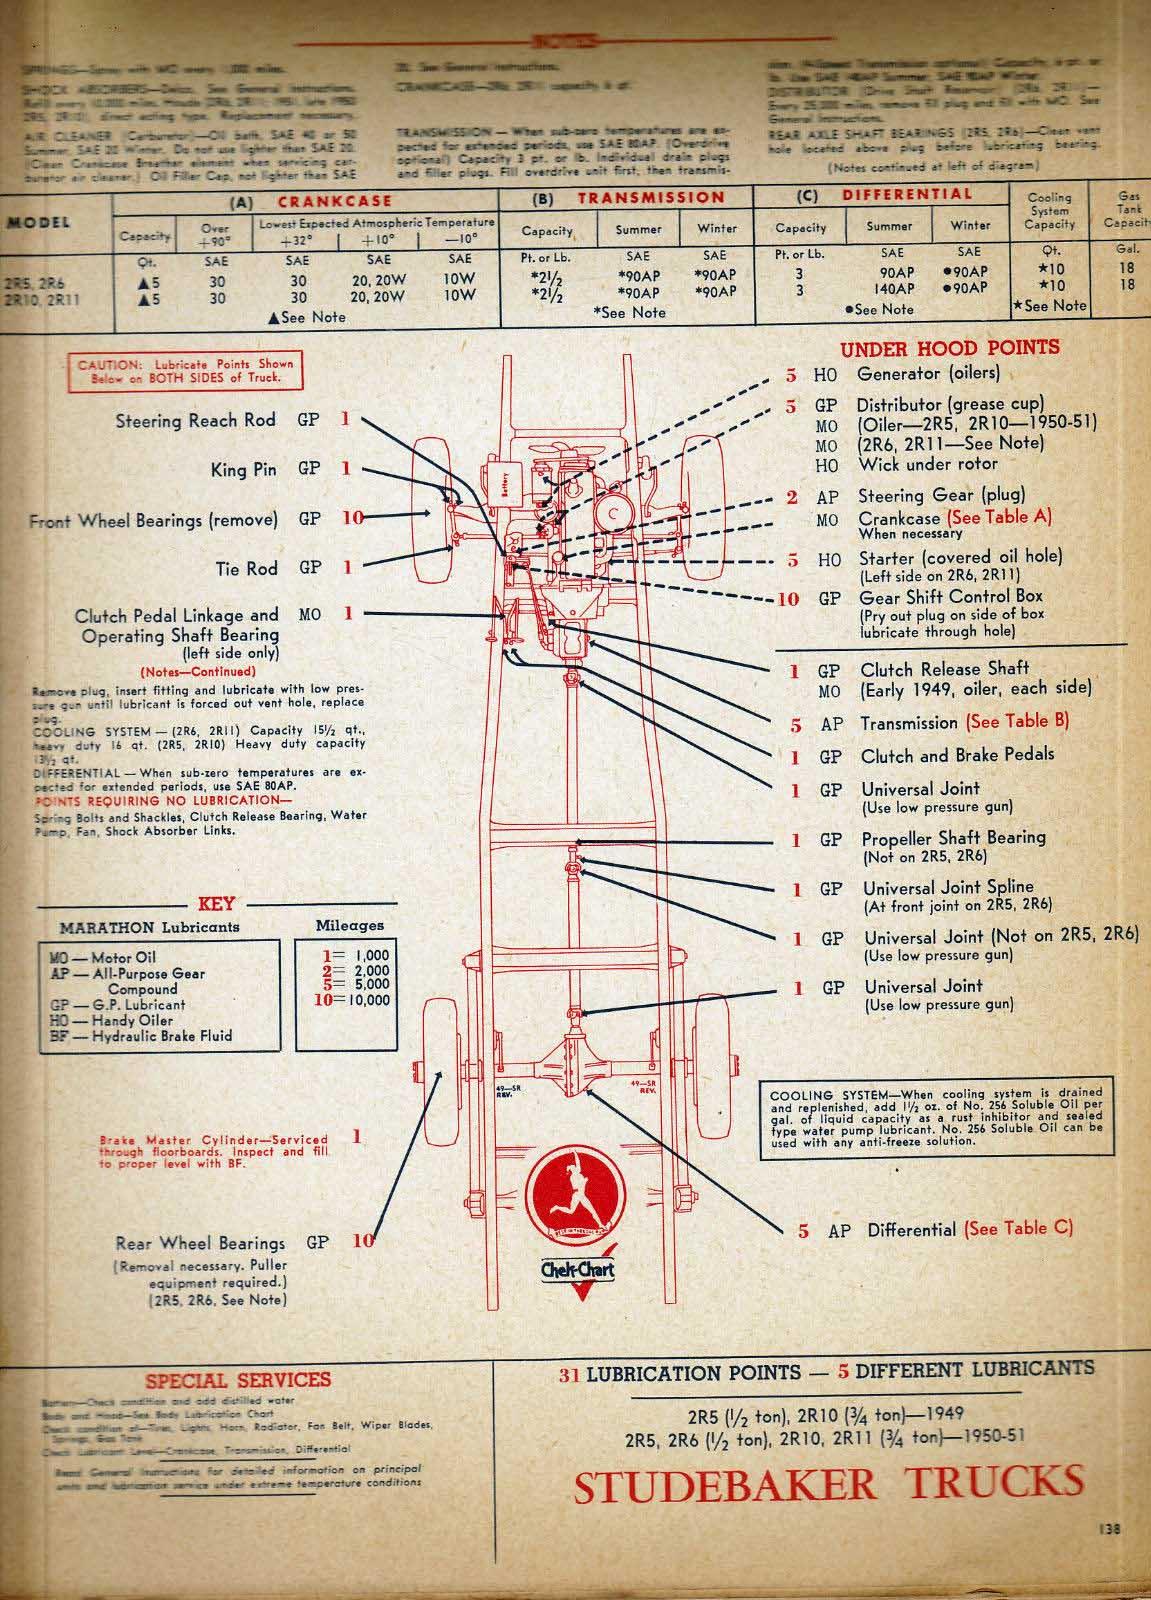 1950 Studebaker Champion Starter Wiring Diagrams International 9200 Diagram Bob Johnstones Resource Website Old Lubrication 1949x52lgttrucklubeb Oldmaint120814ahtml